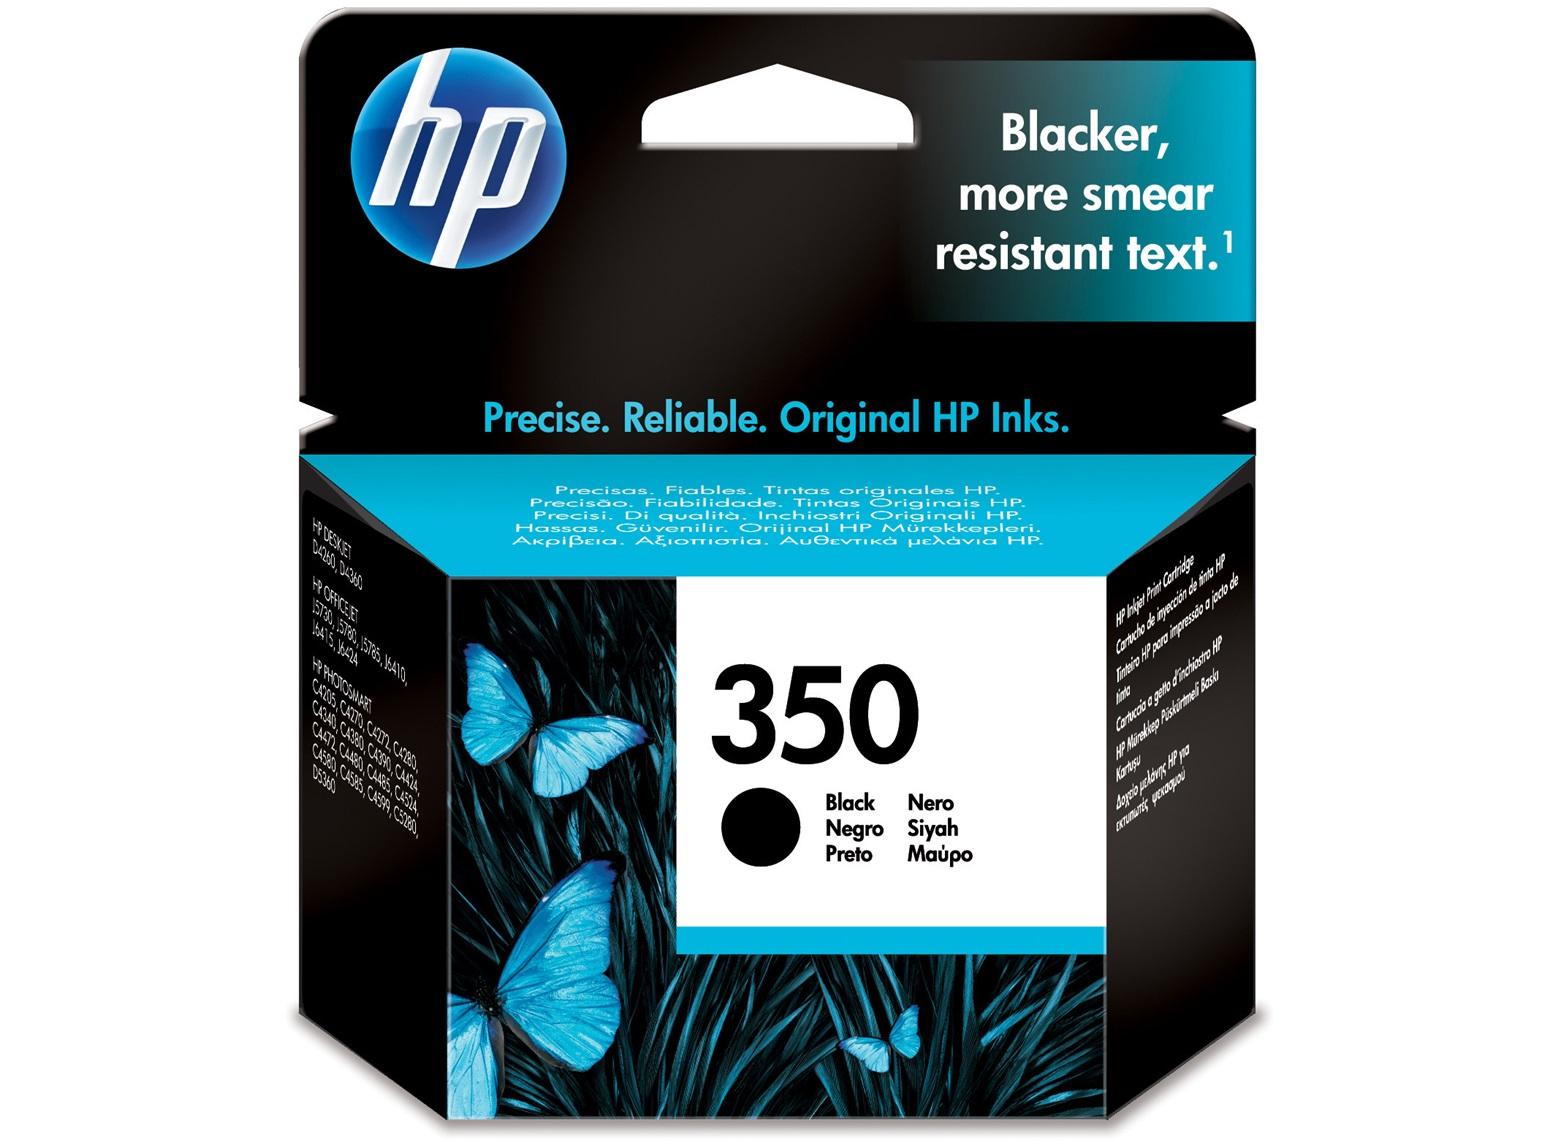 350 Cartucho de tinta negra HP (200pg)